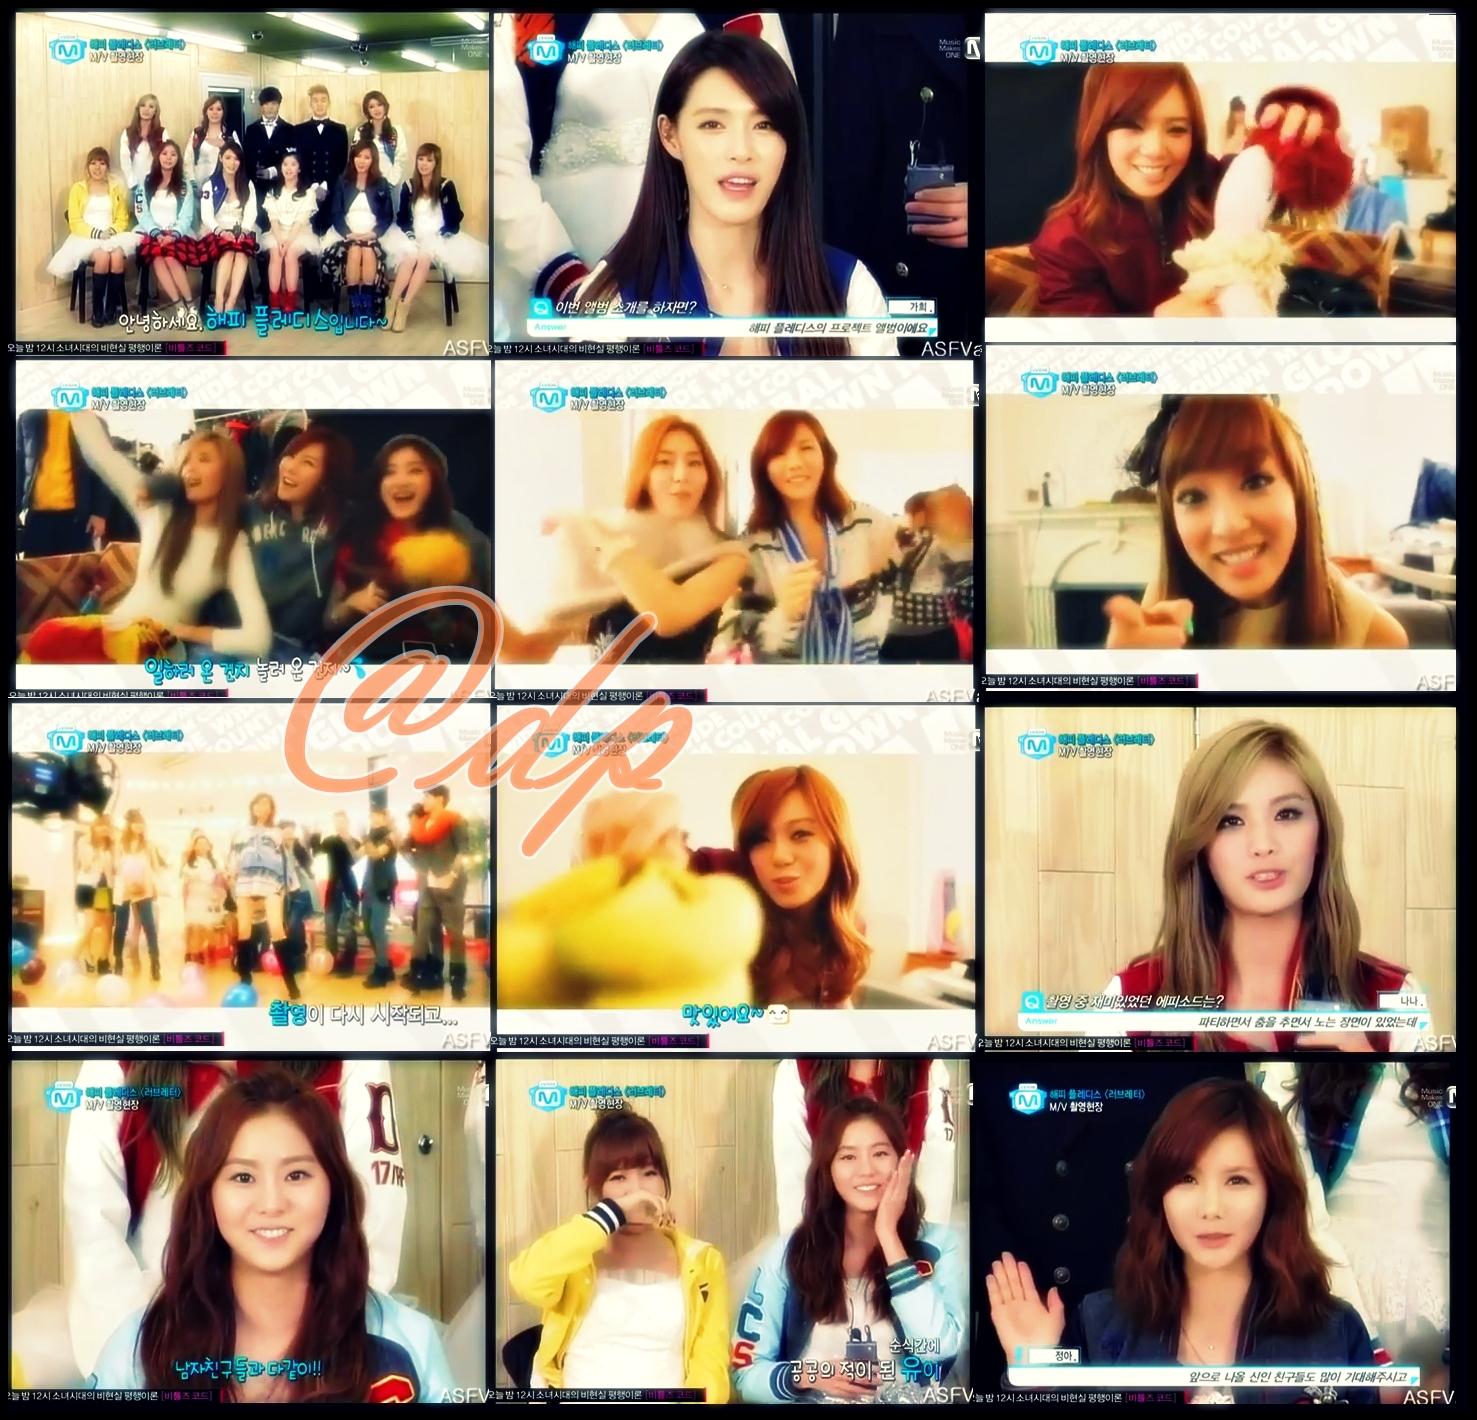 VID Funny BTS Interview Happy Pledis 2012 Making MV Love